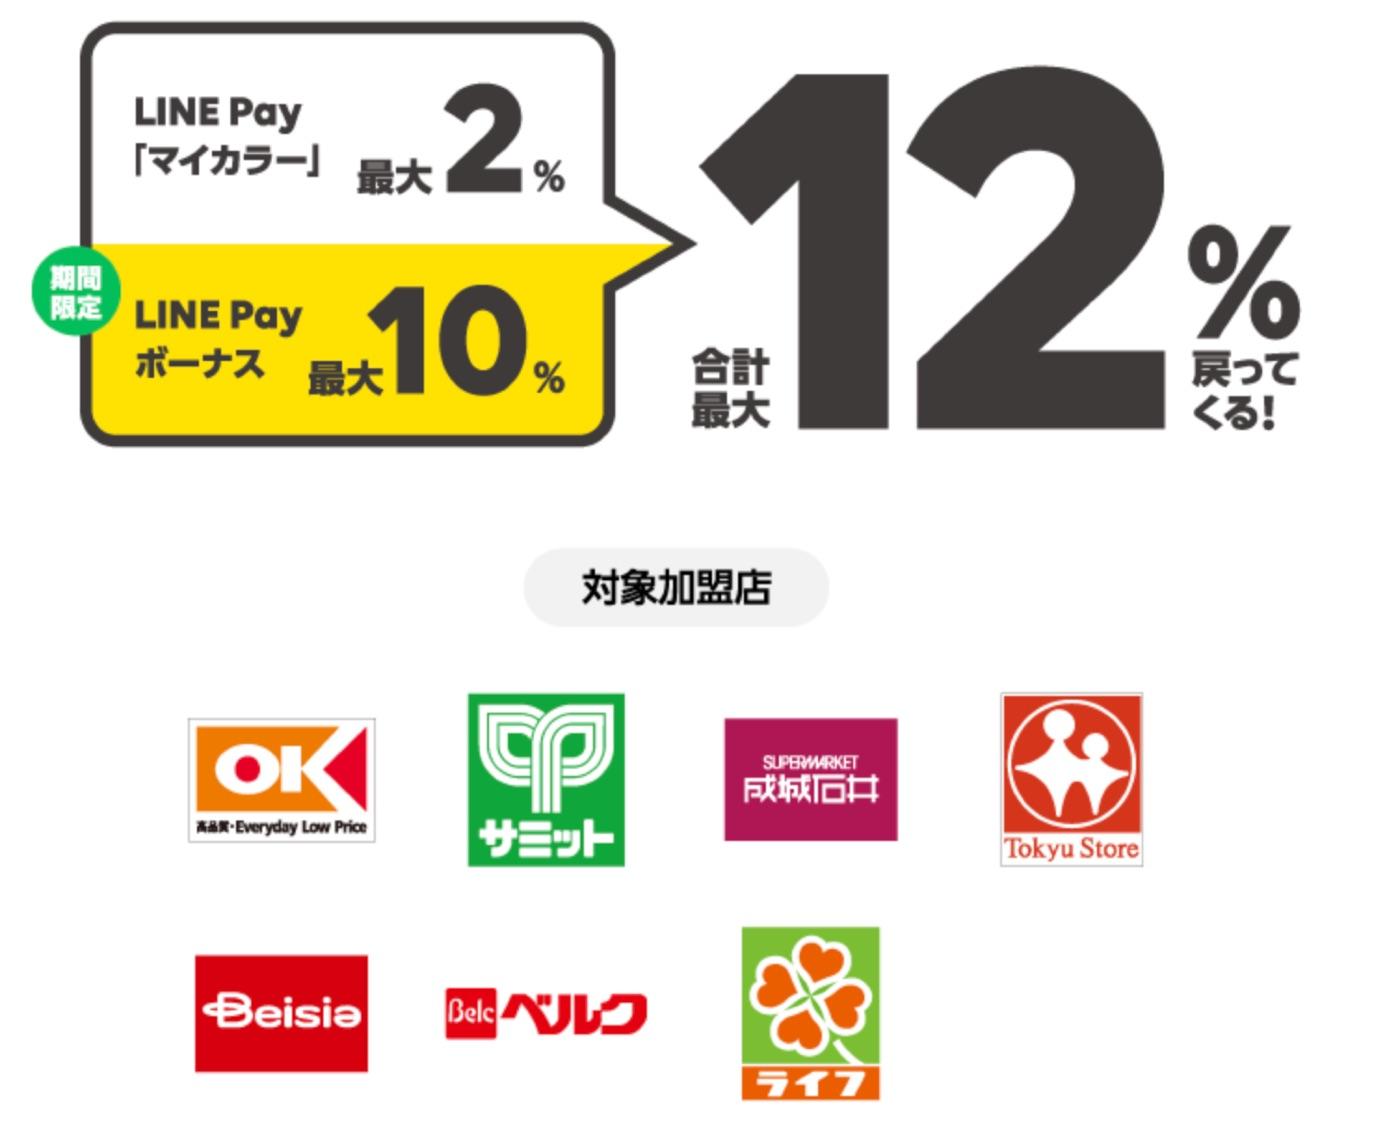 LINE Payが「LINE Pay生活応援祭」を実施中!